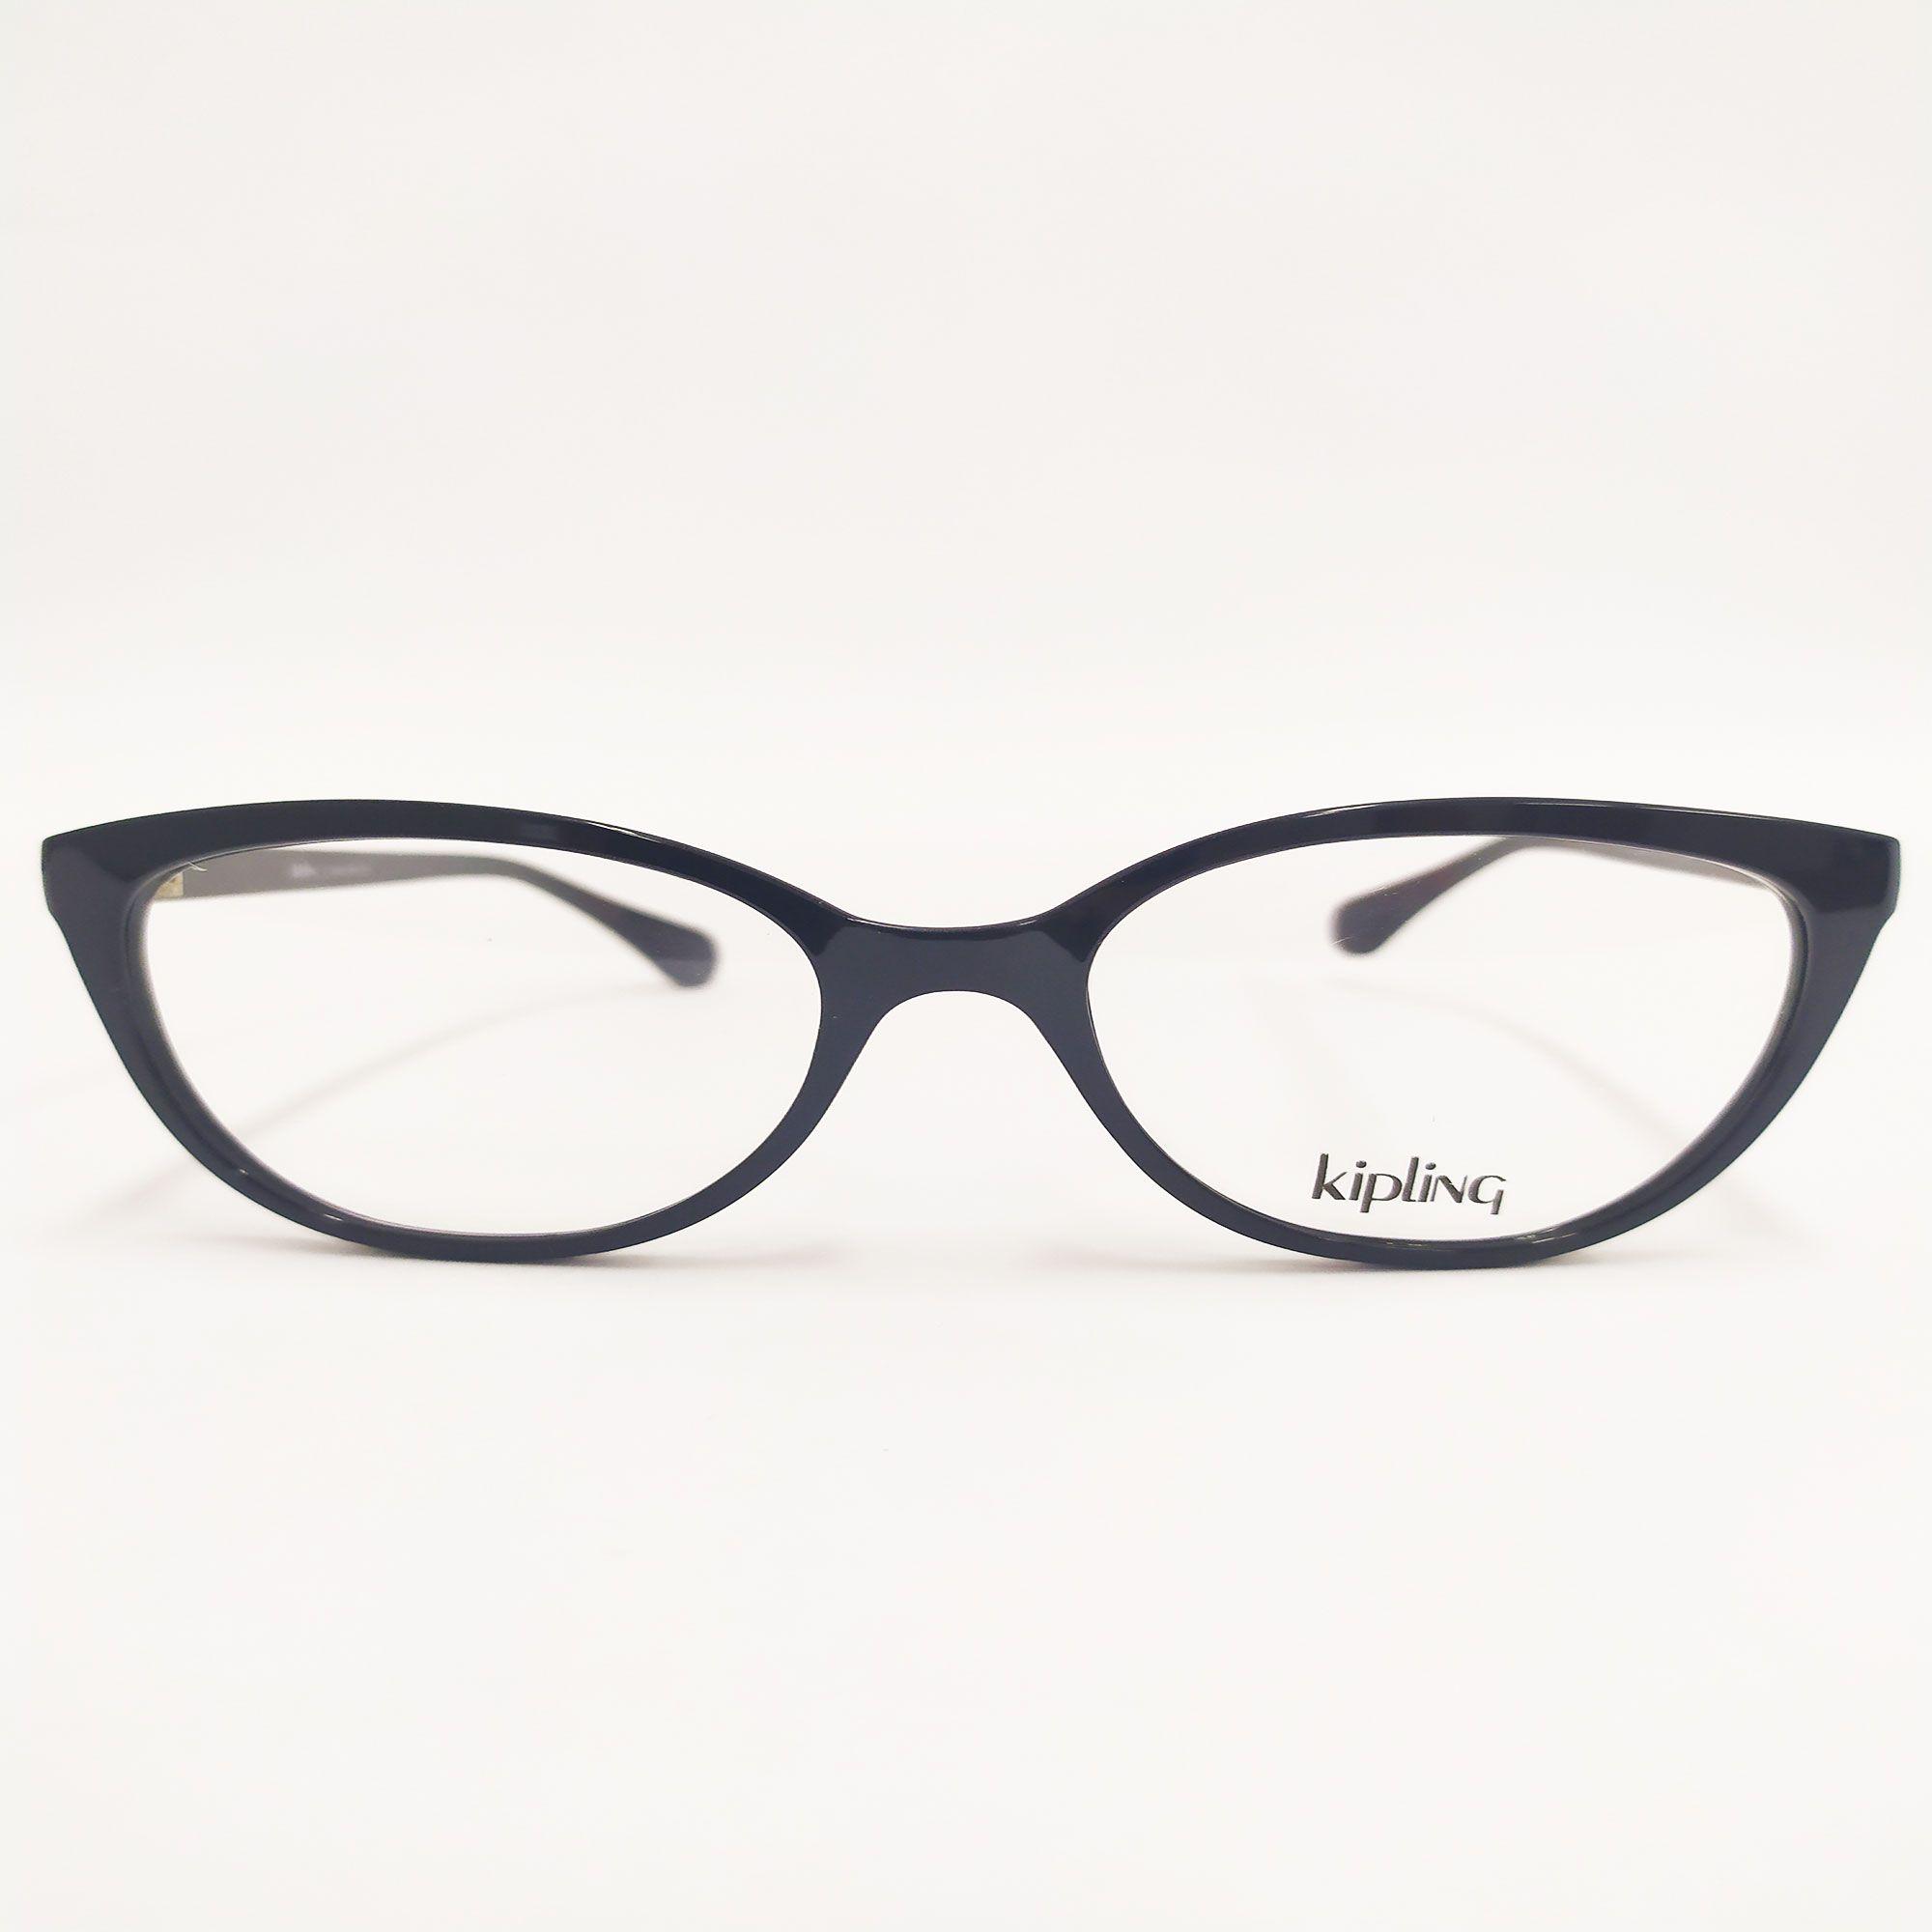 Óculos de Grau Kipling Preto 3083 E054